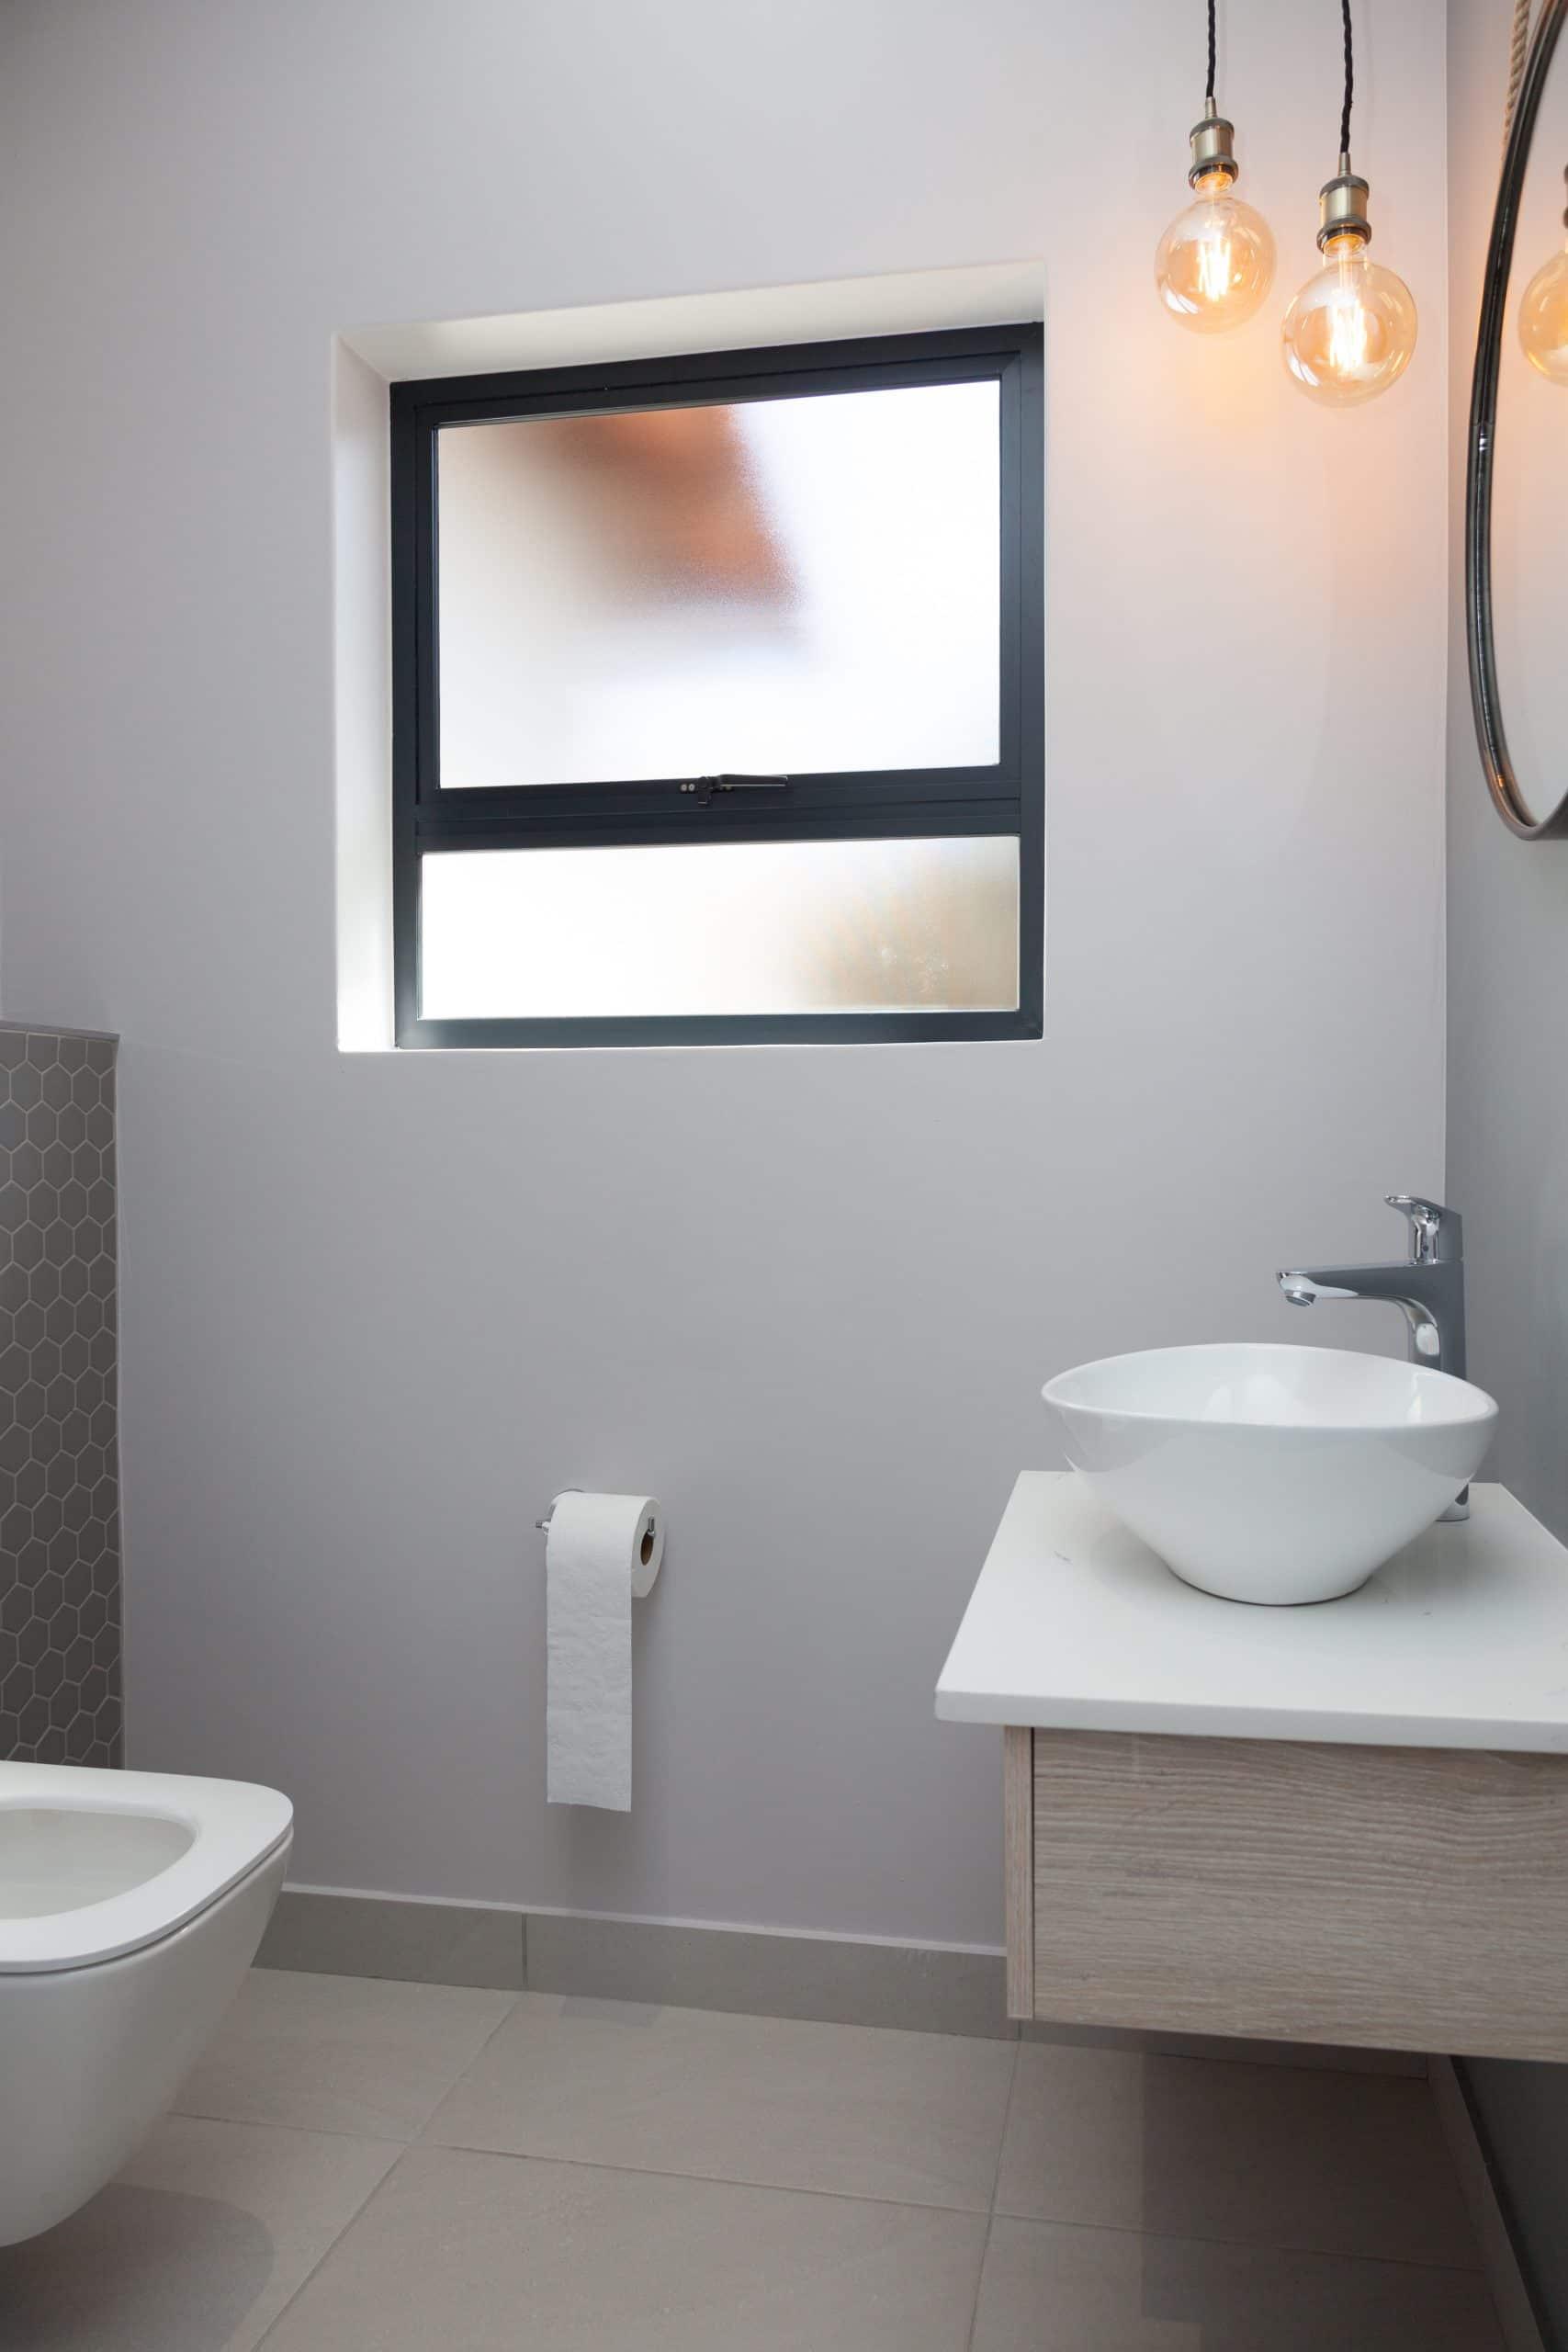 expose lamp pendants in bathroom